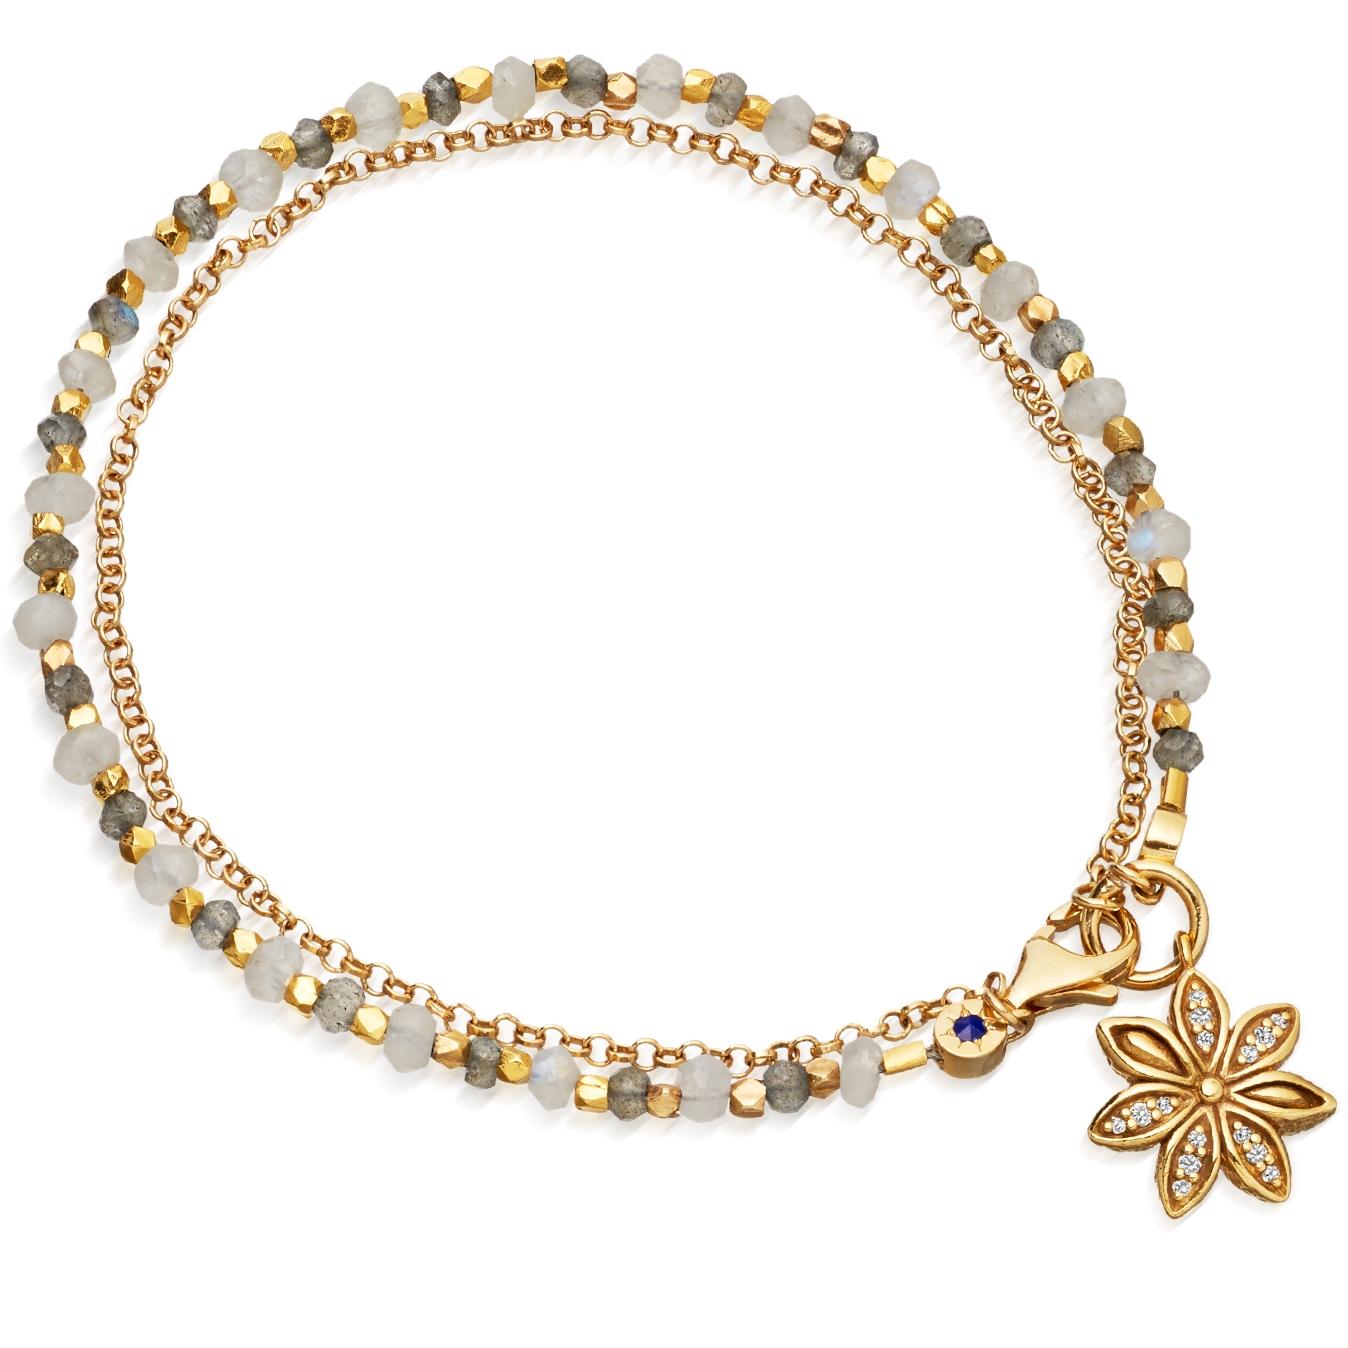 Labradorite Star Anise Biography Bracelet